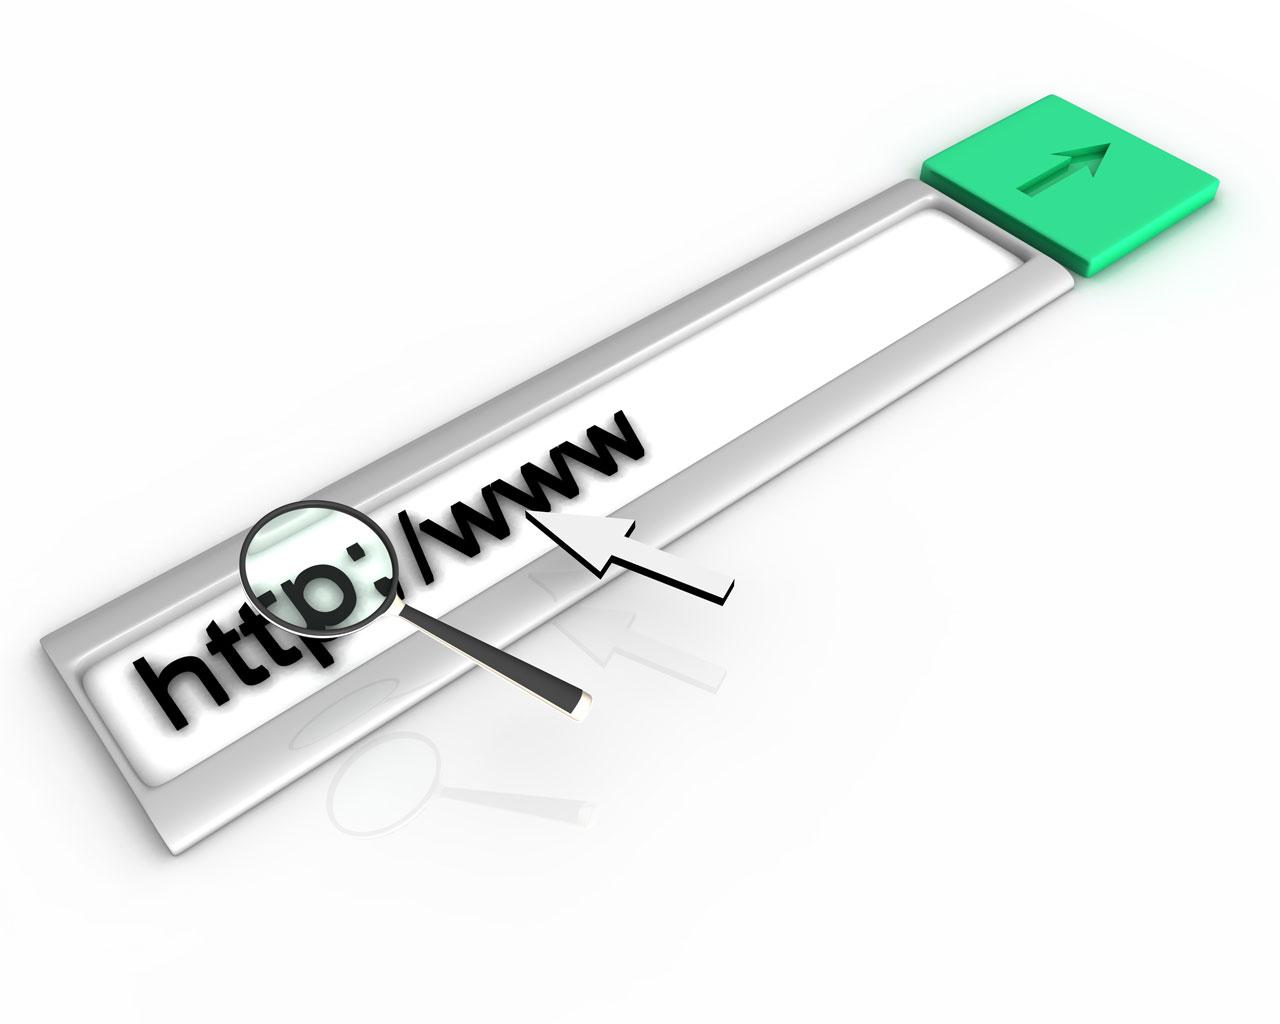 Stringing Tips: My Random Craigslist Search looking at